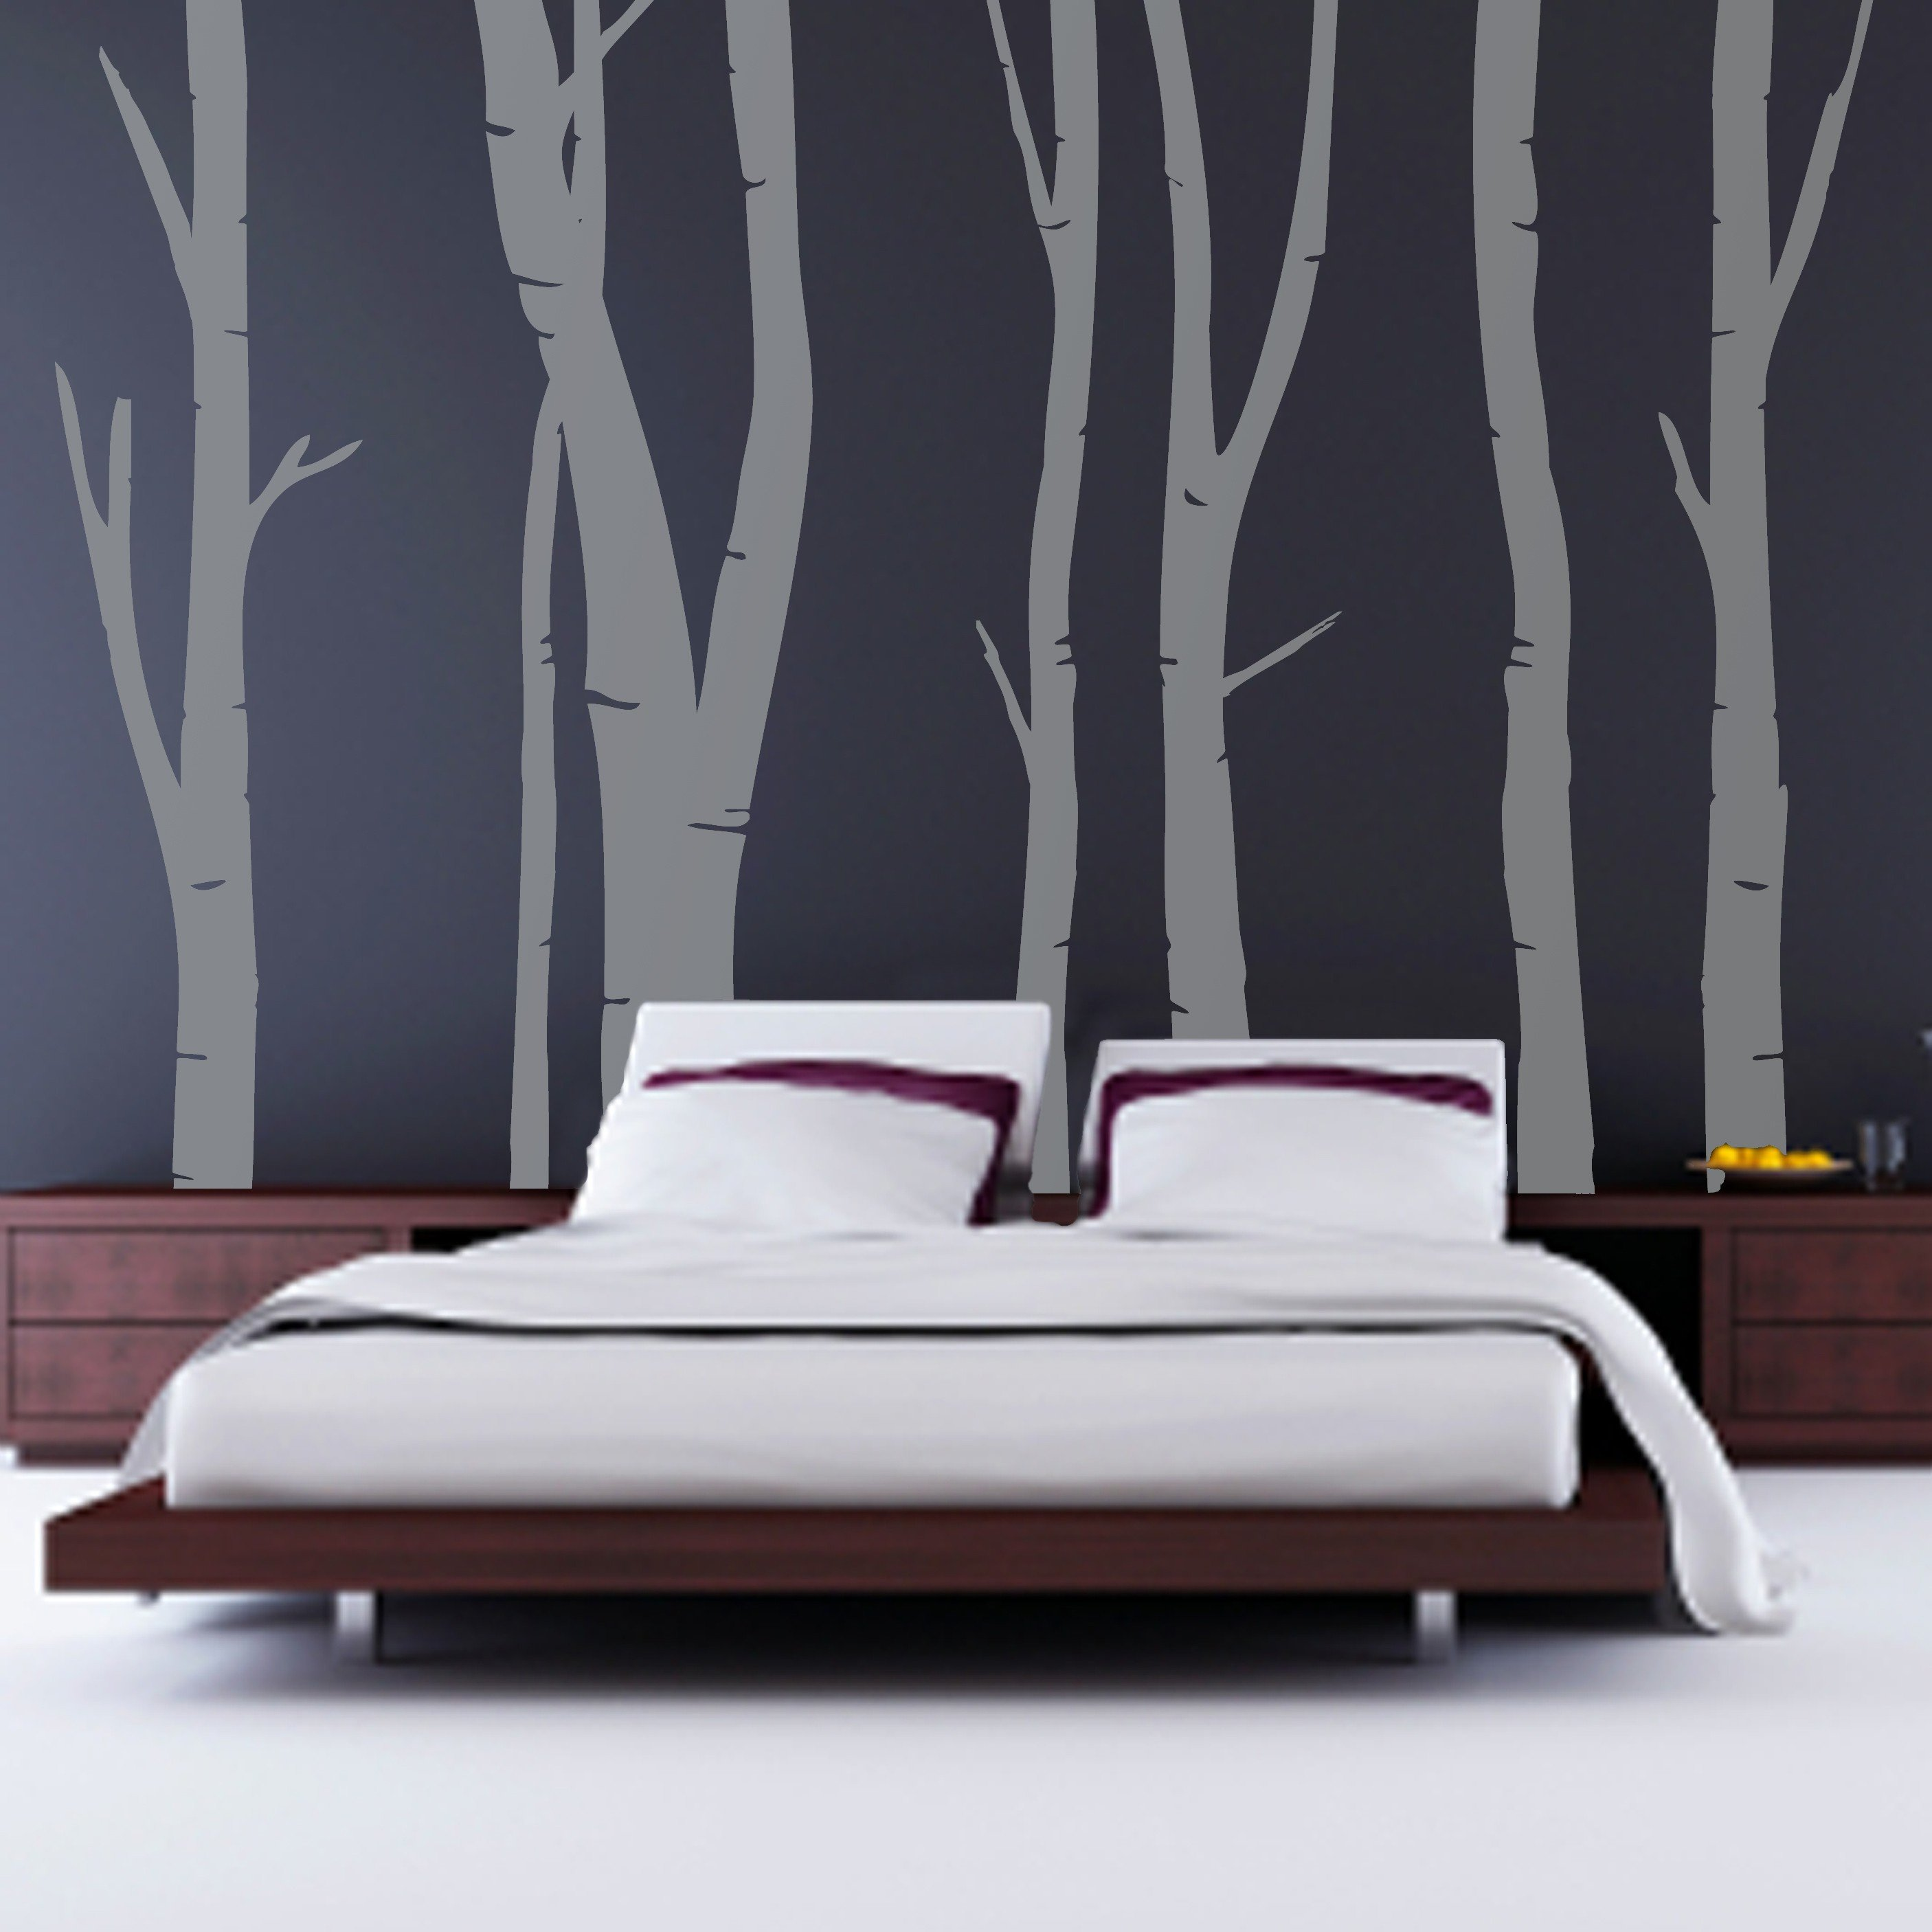 Rustic Bedroom Wall Decor Unique 15 Stylish Galvanized Tin Wall Vase